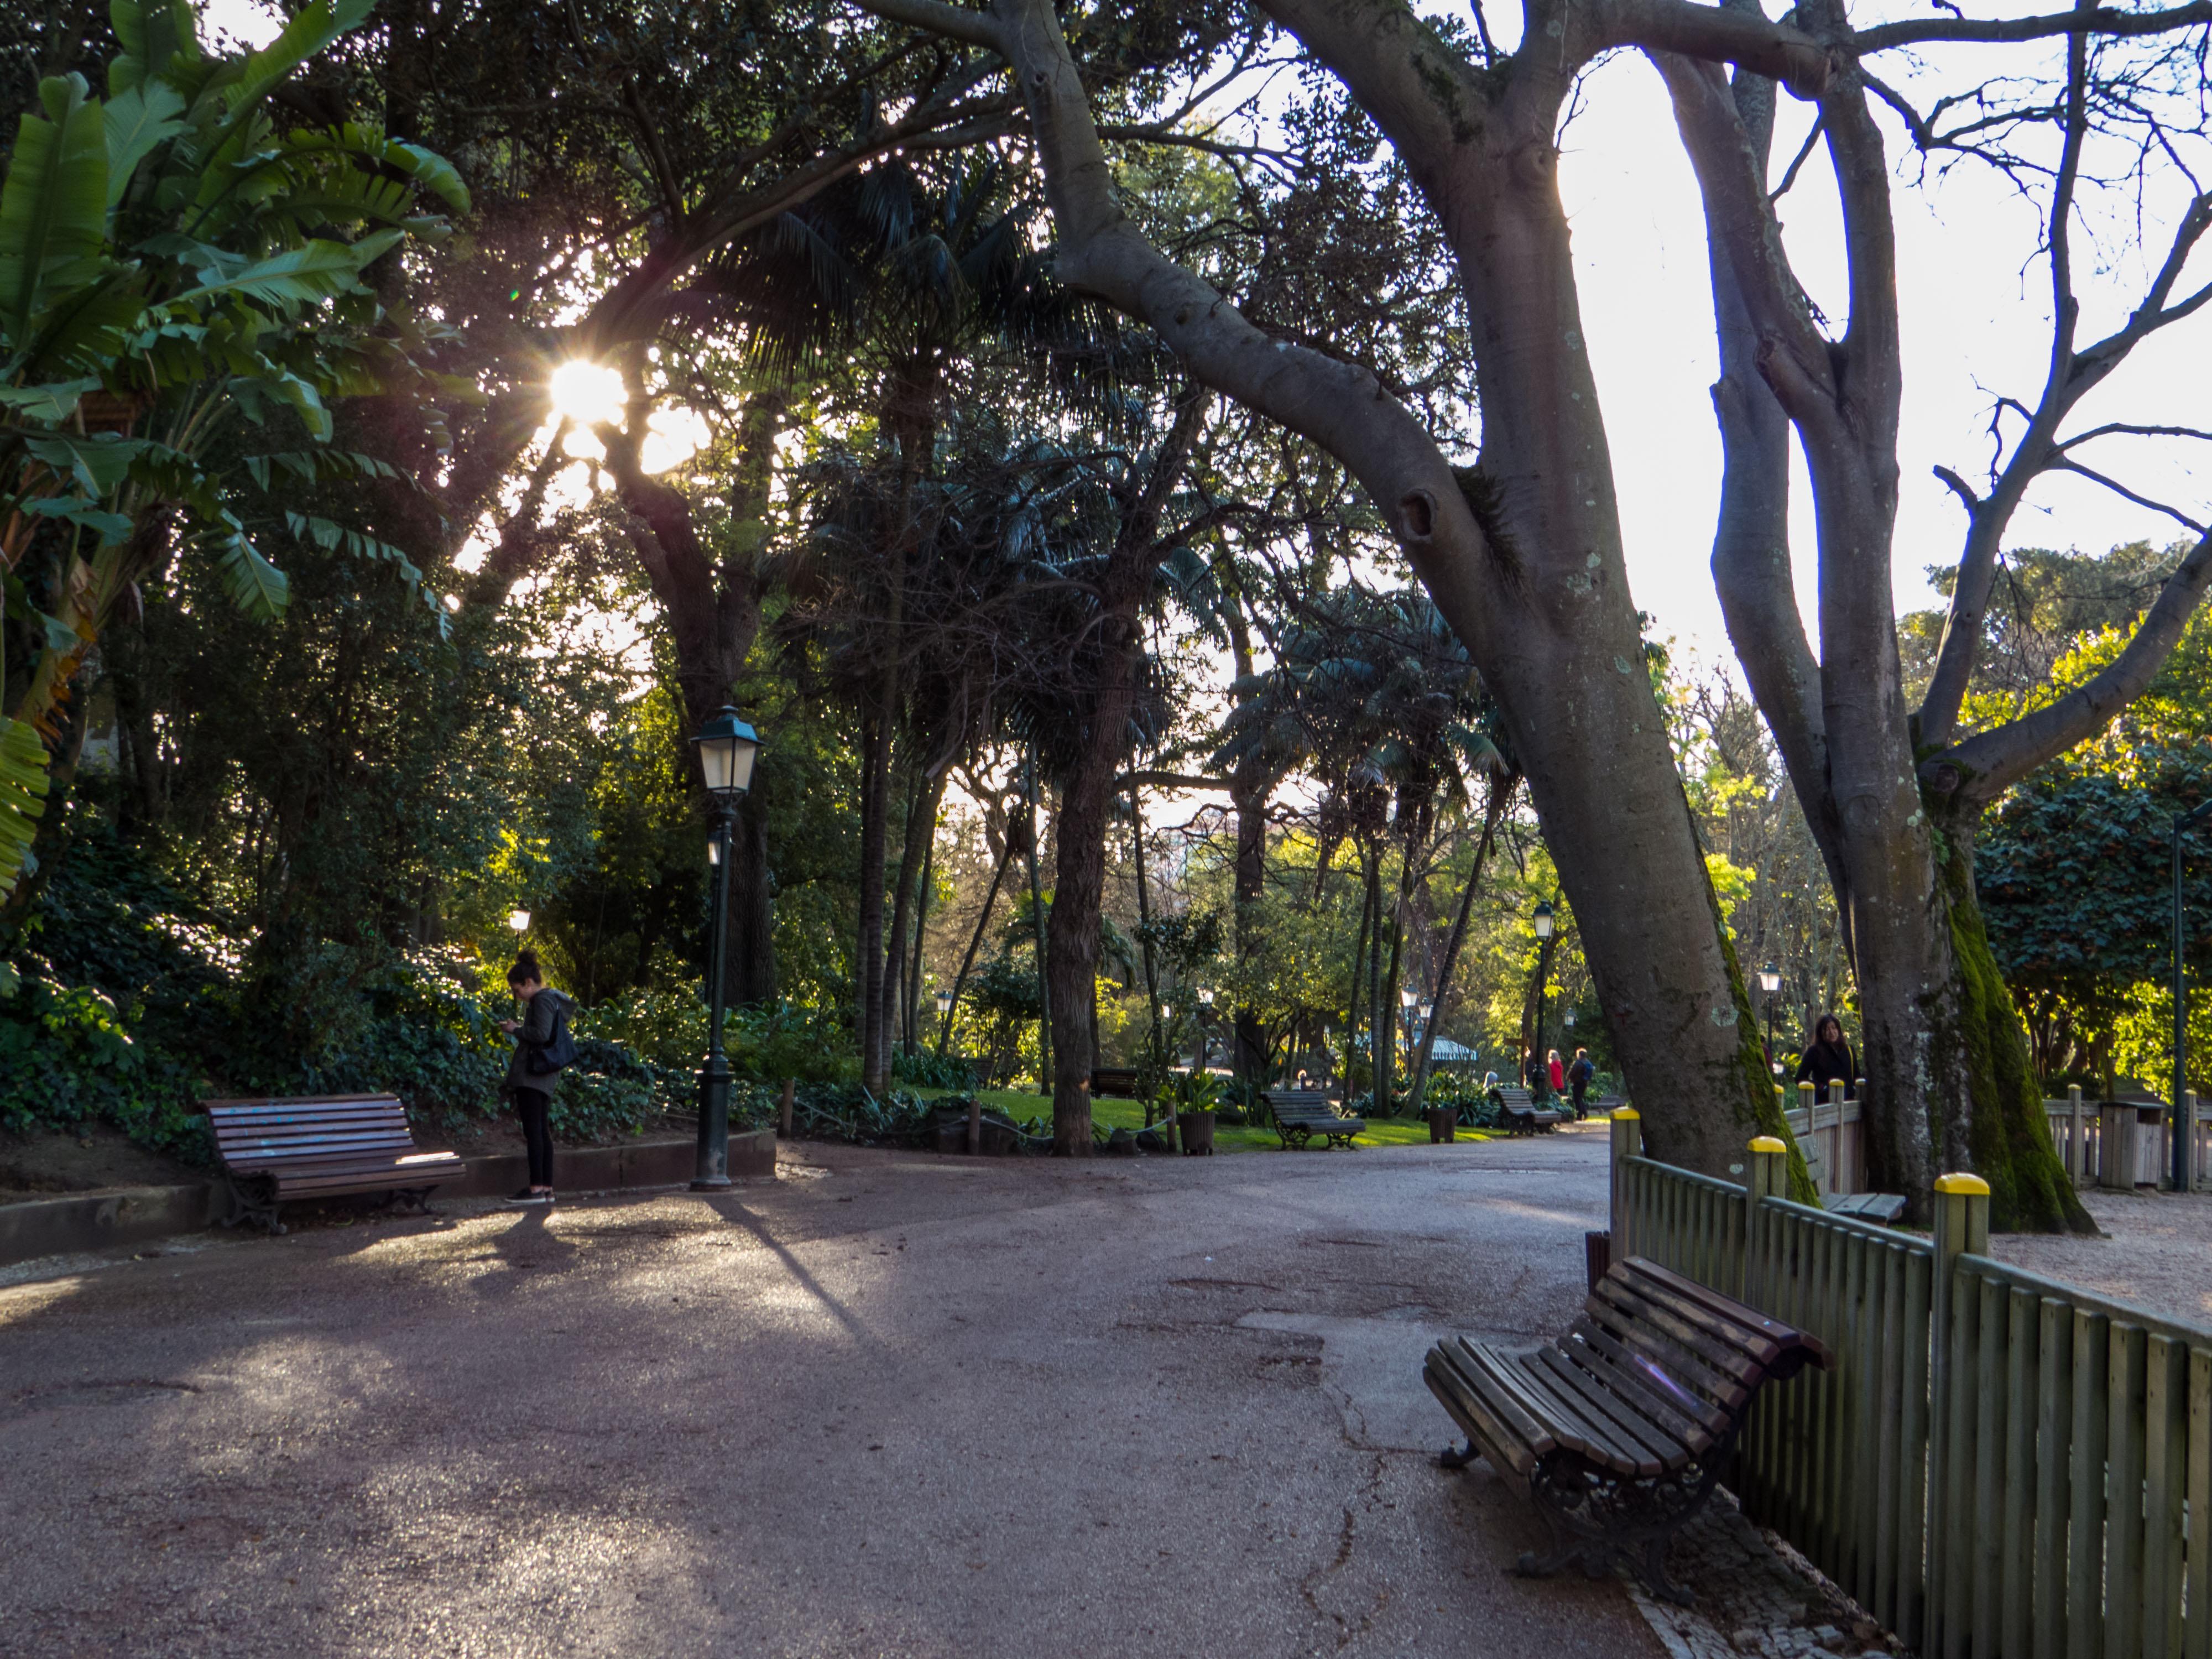 Park, Portugal, Road, Trees, Walk, HQ Photo